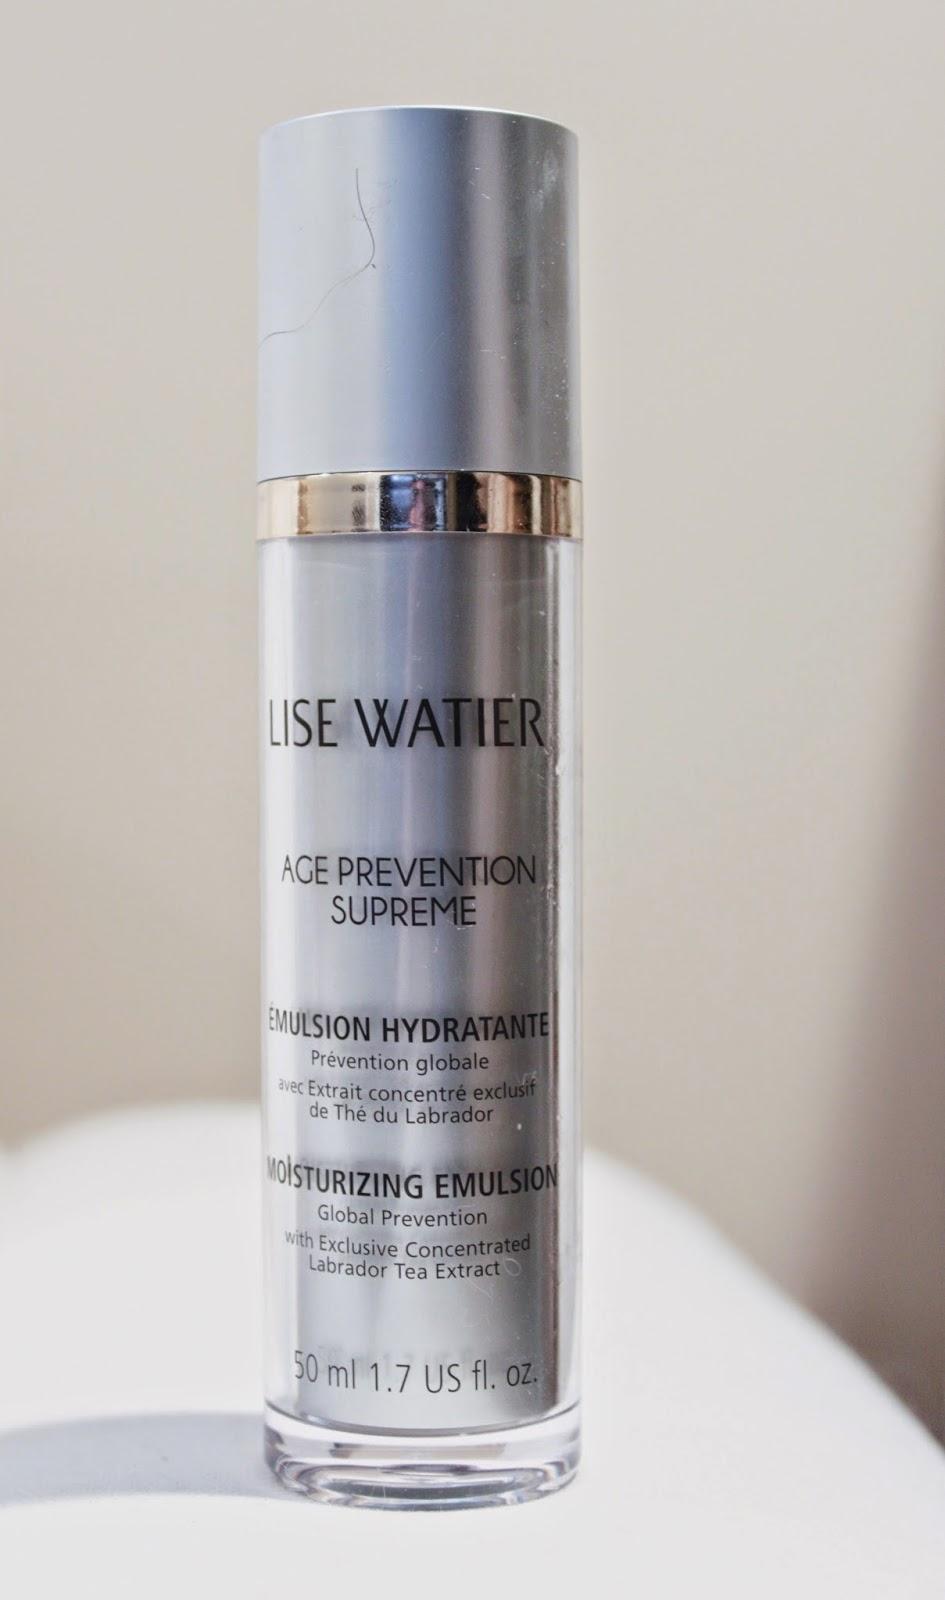 Just J: Lise Watier Age Prevention Supreme Moisturizing Emulsion